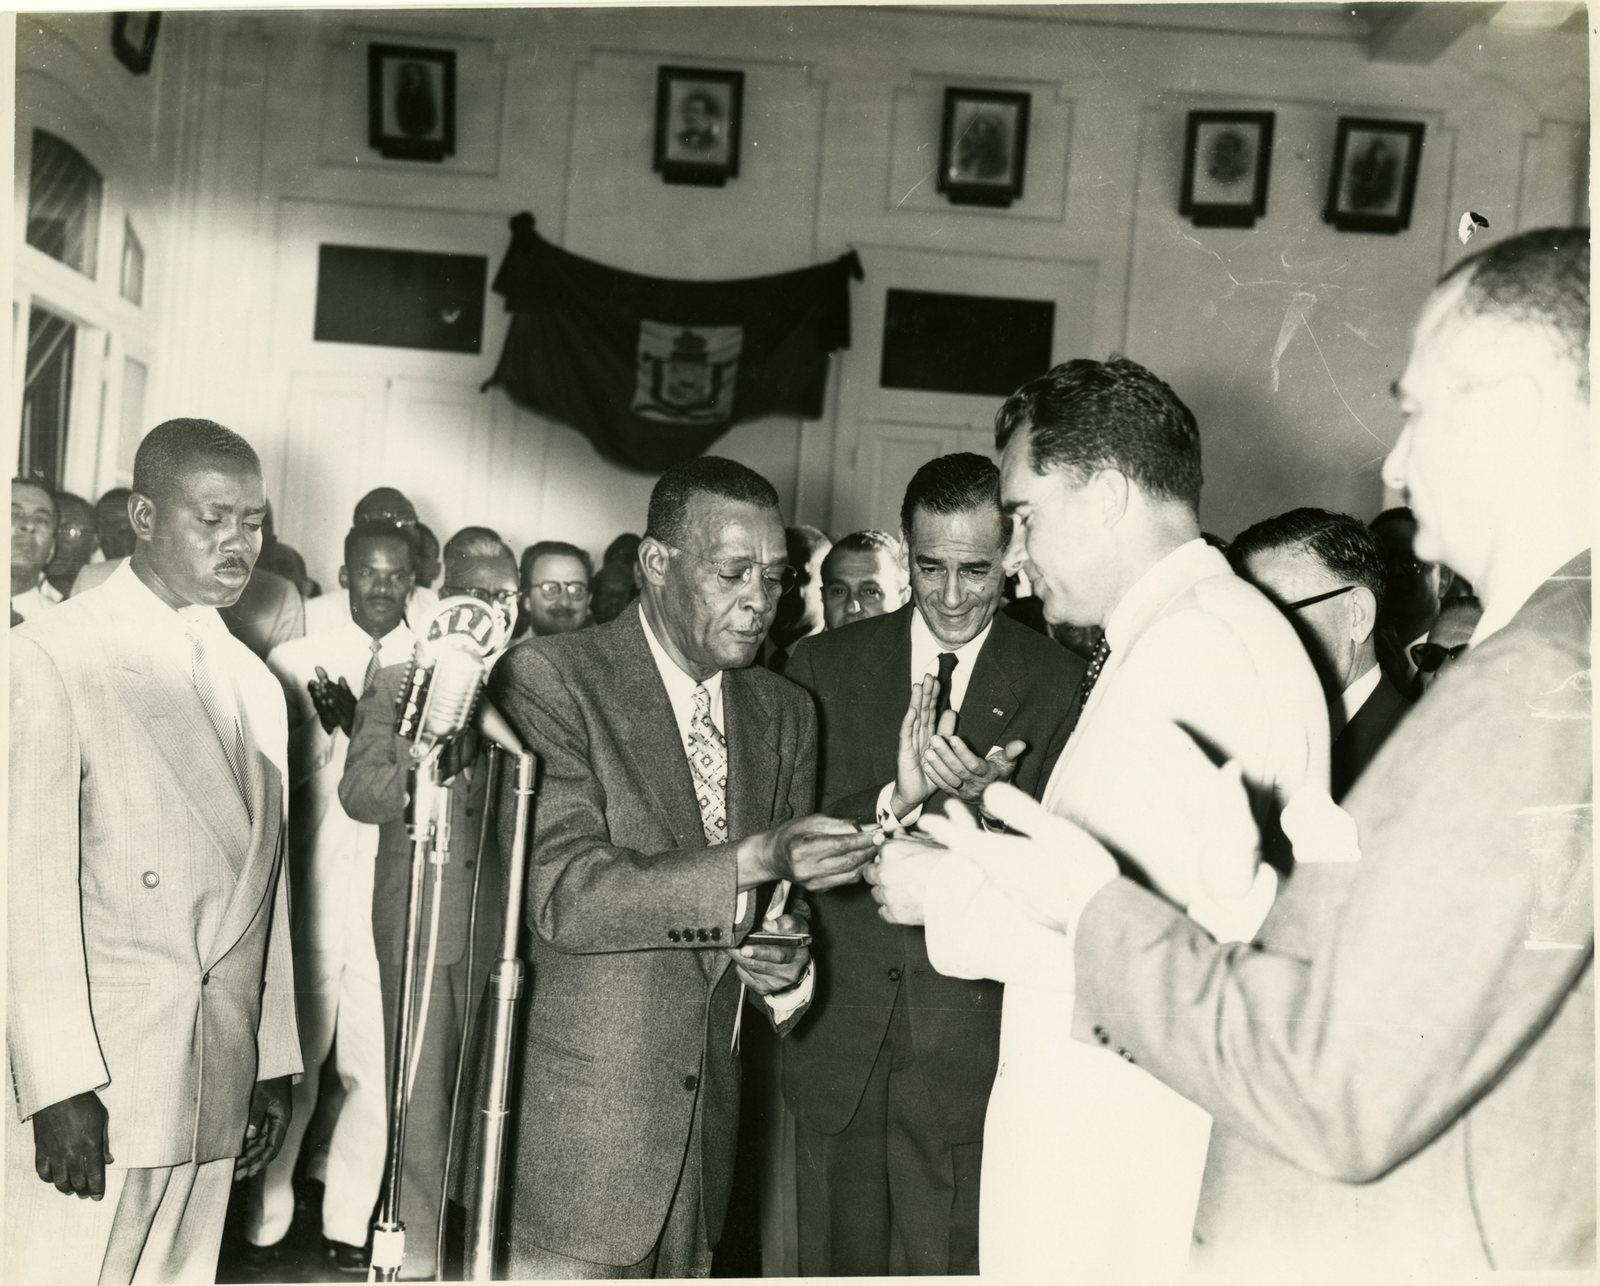 Vice President Richard Nixon receives a key to the city in Port-au-Prince, Haiti